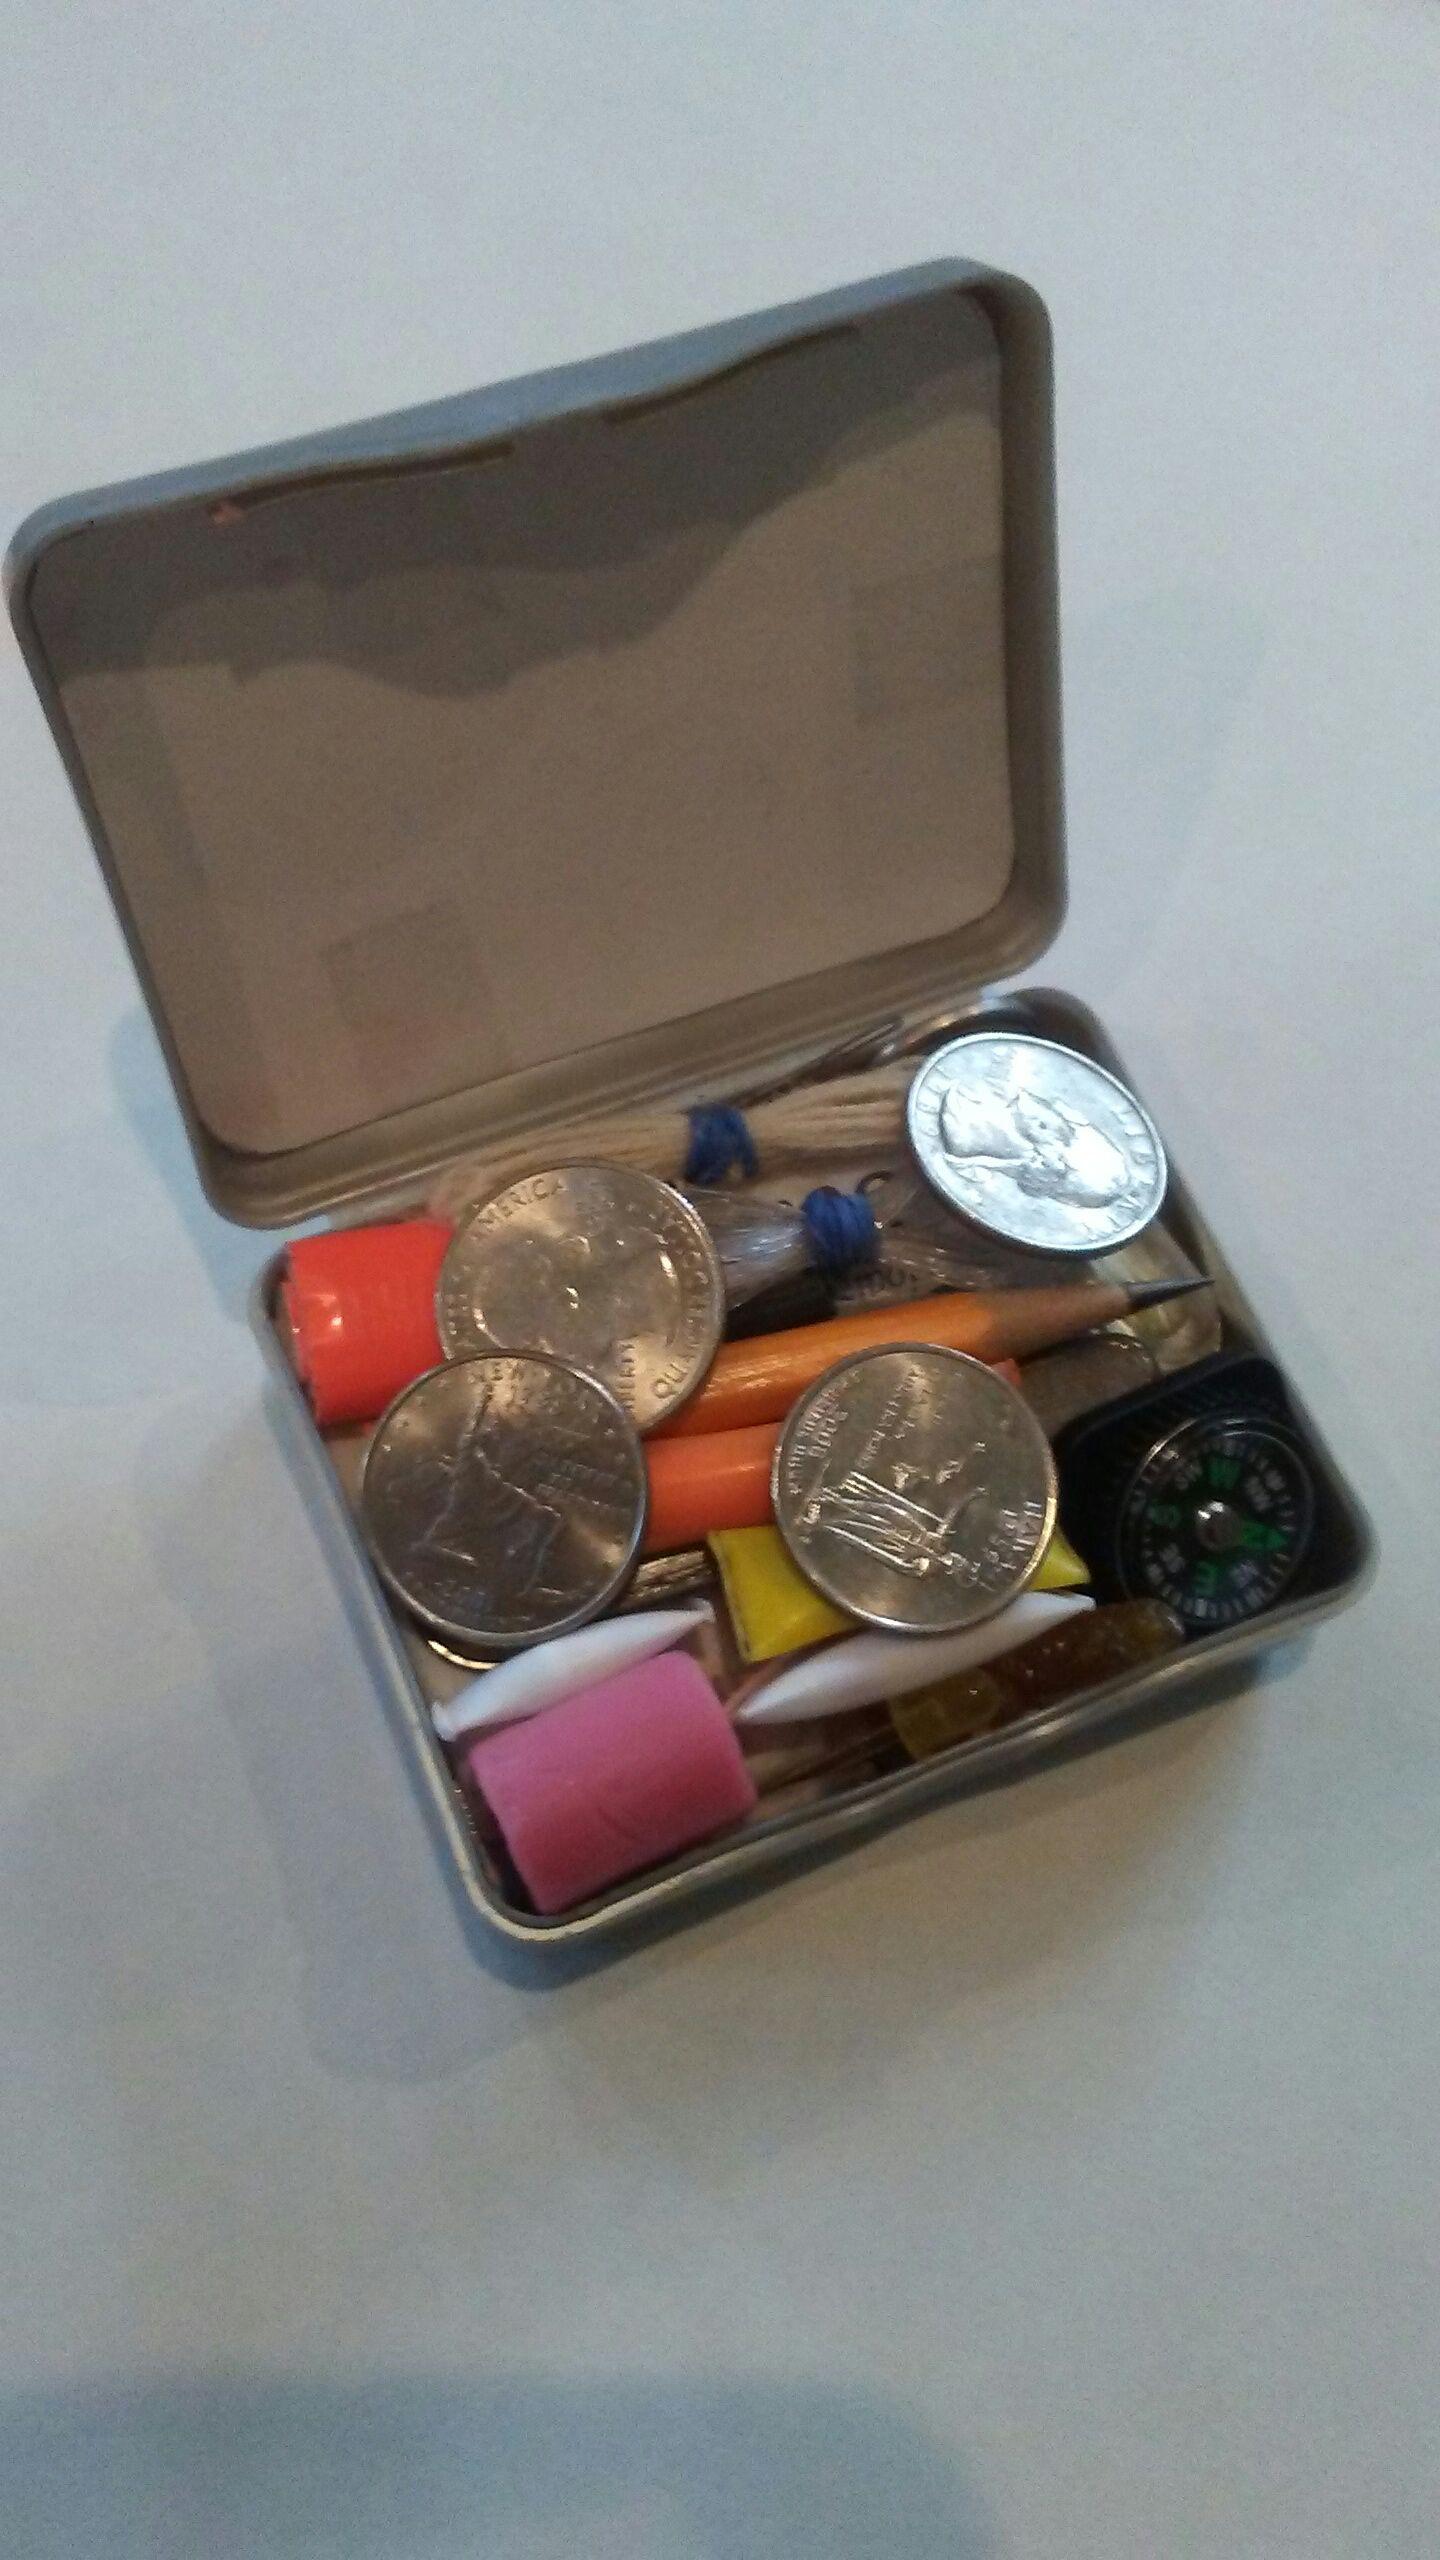 Pocket Survival Kit Grande 2.0